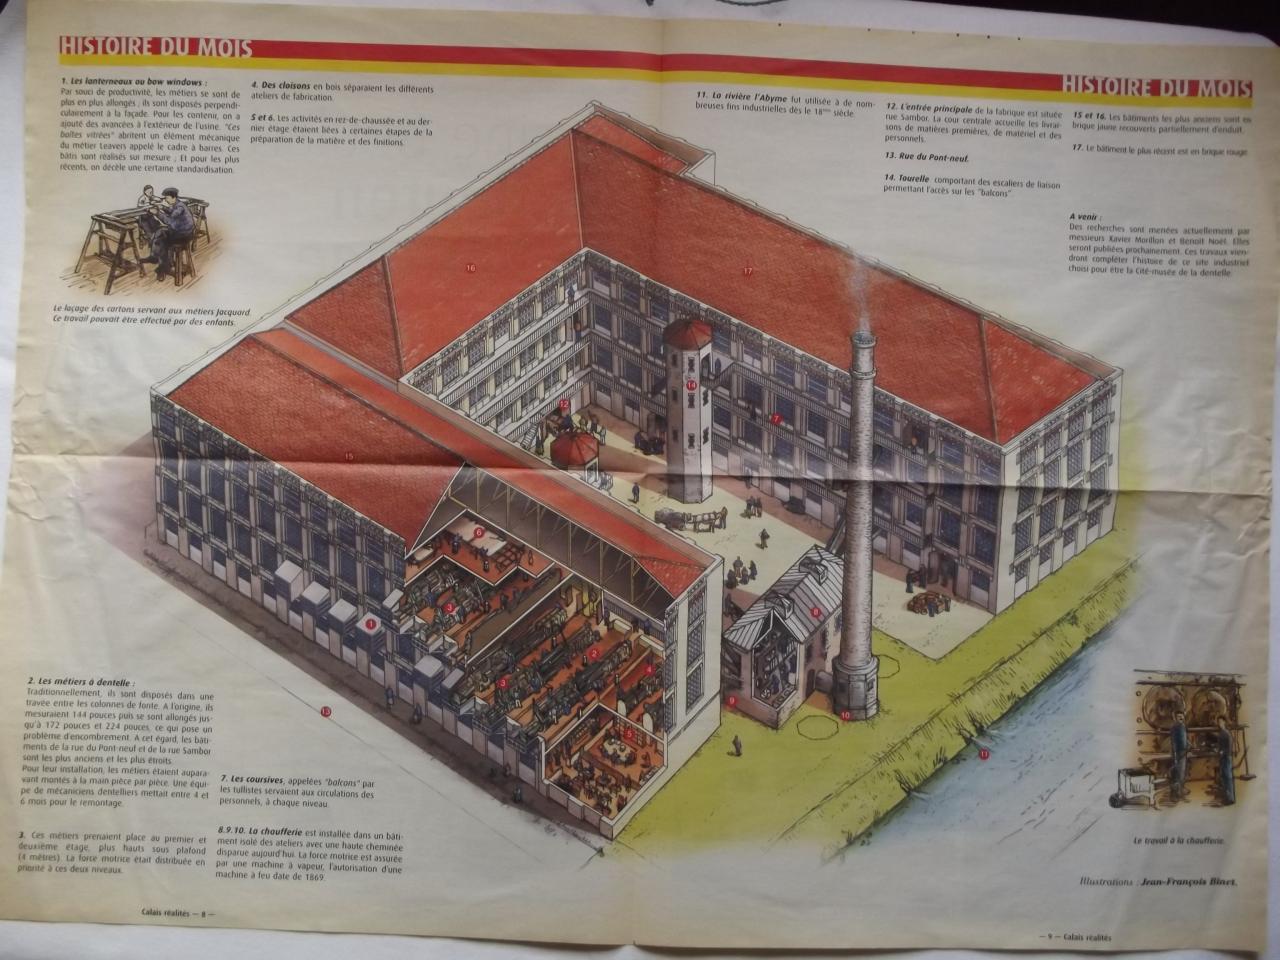 L'usine Boulart 2